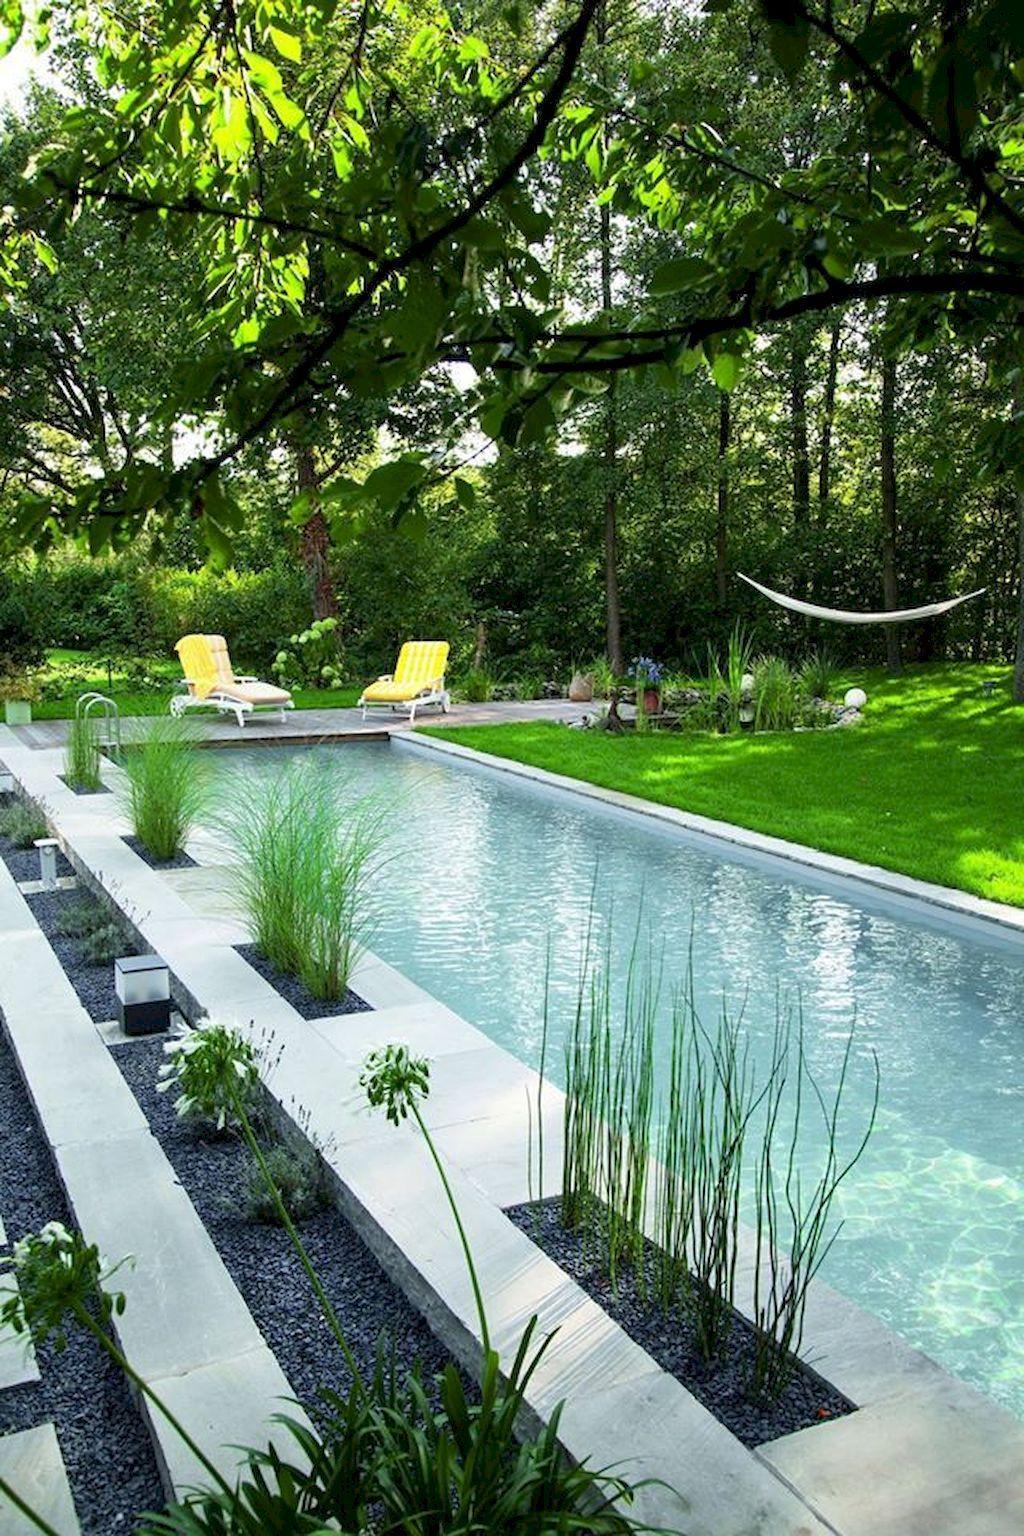 Wondrous Evolution Within The Swimming Pool Design Https Crithome Com Evolution In The Swimming Pool Design Pool Landscaping Backyard Pool Garden Pool